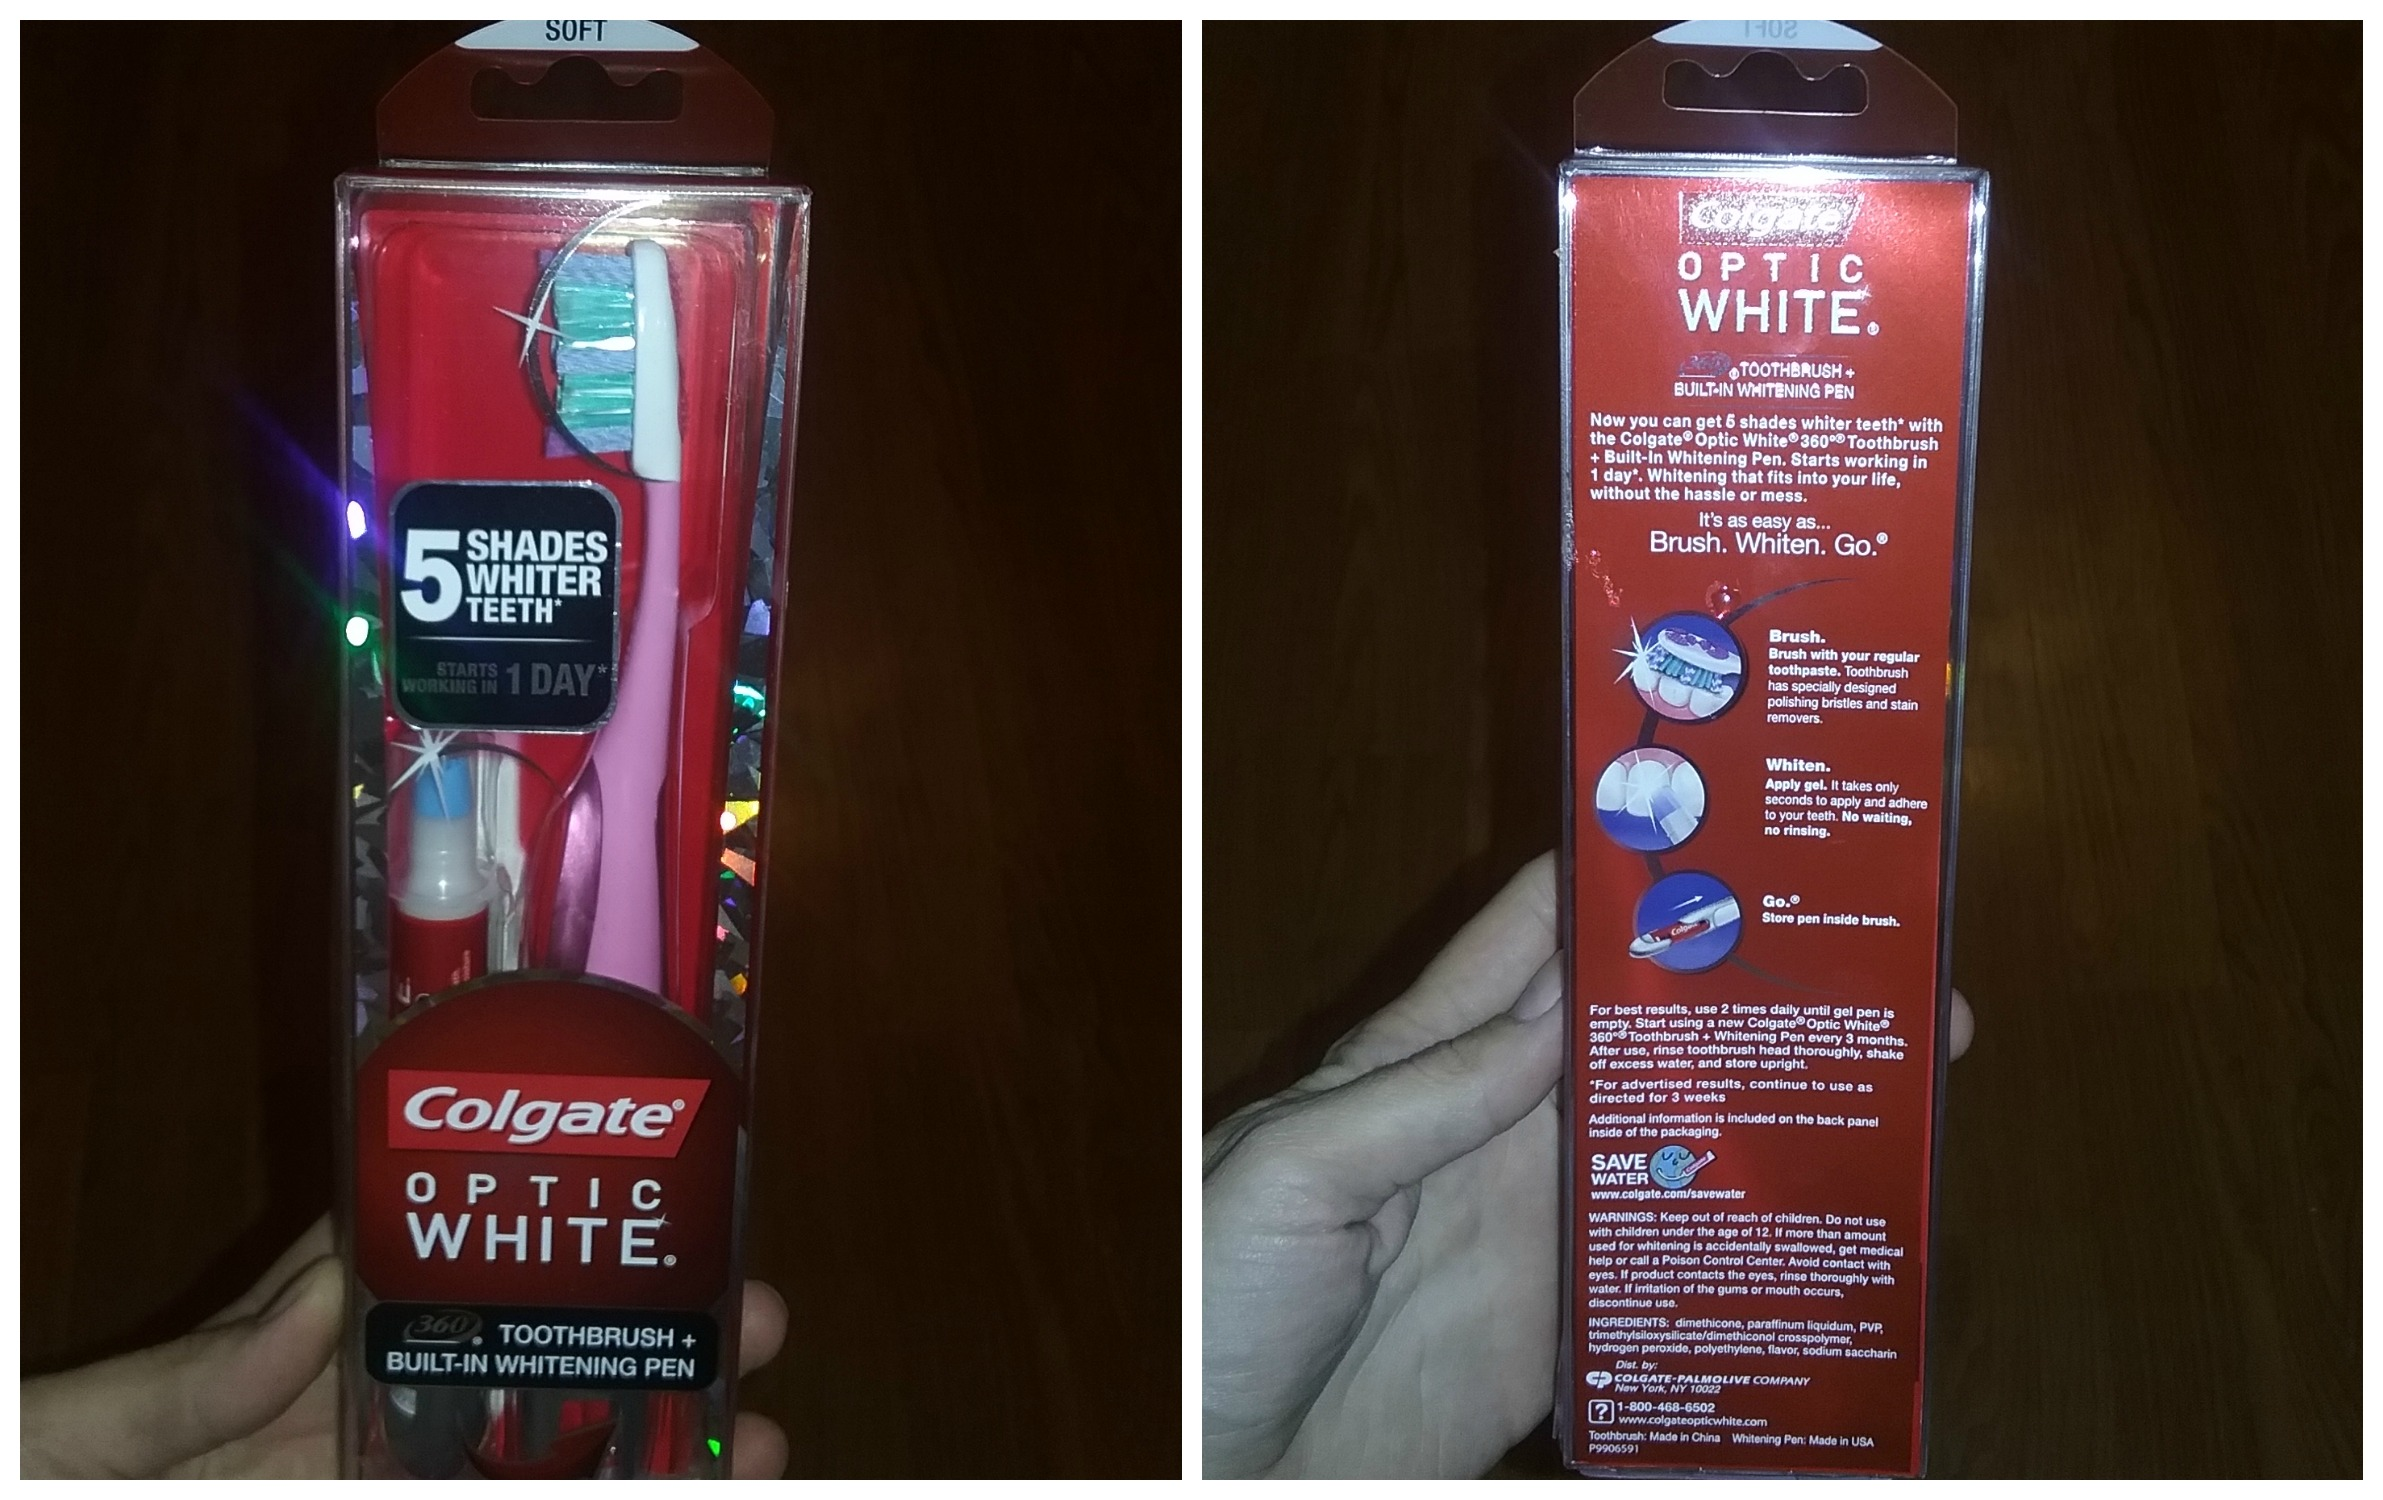 Colgate Optic White Toothbrush Whitening Pen The Summer S Must